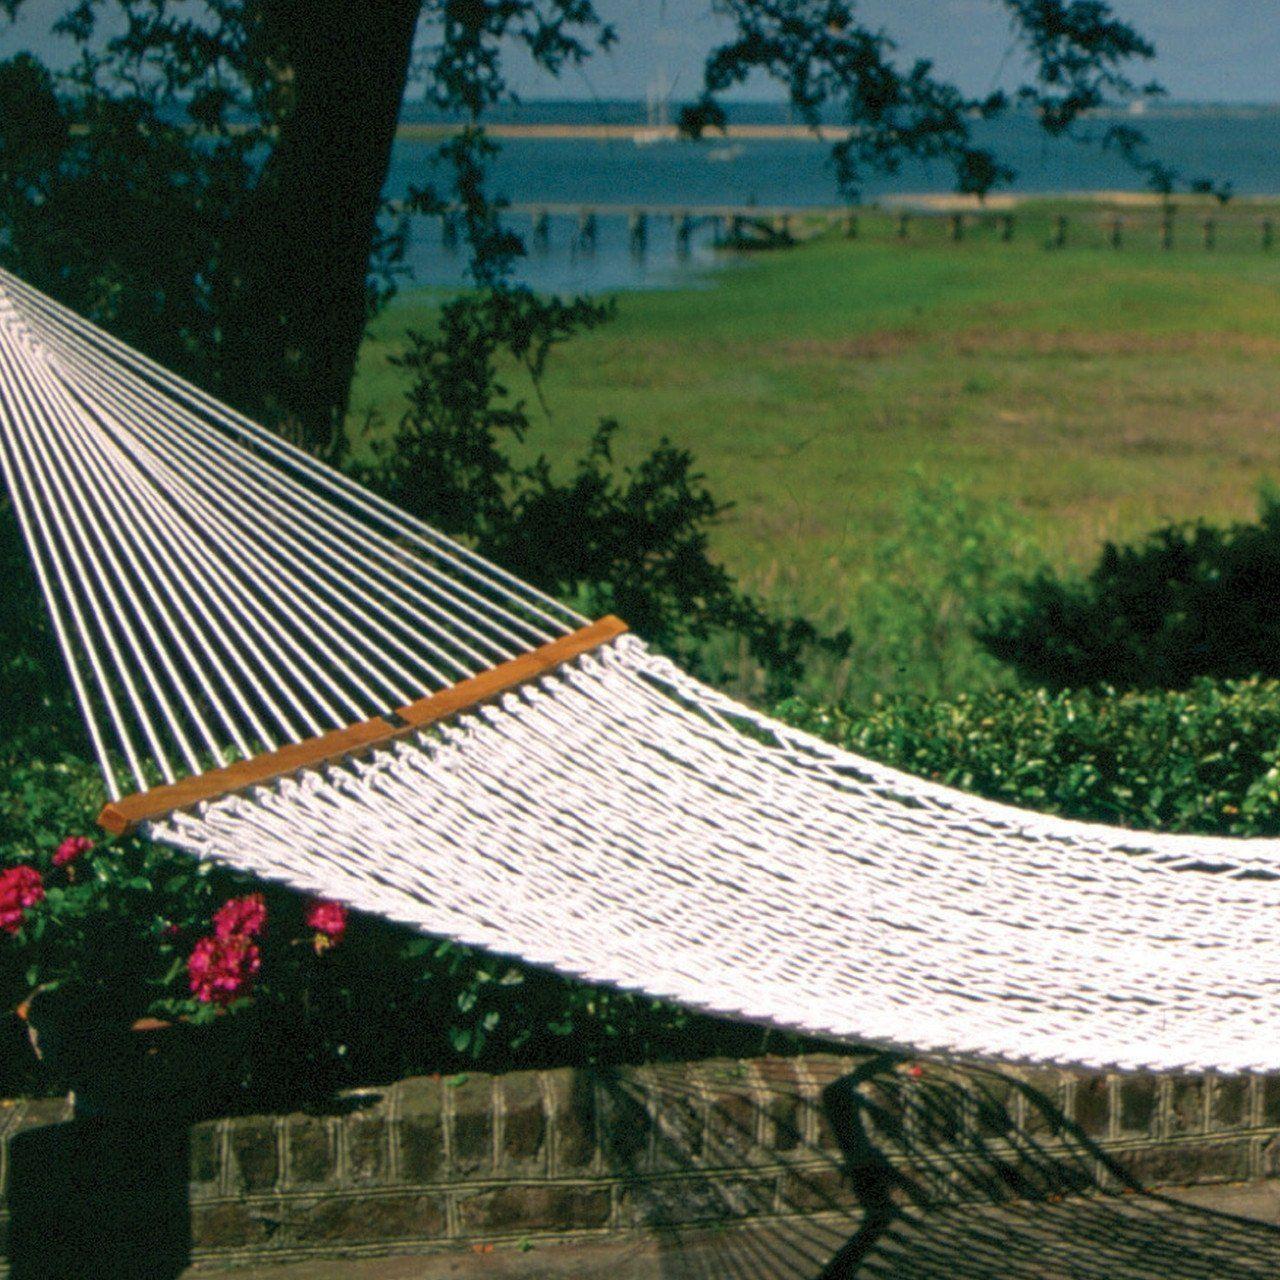 pawleys ideas of island stand design many hammocks types hammock